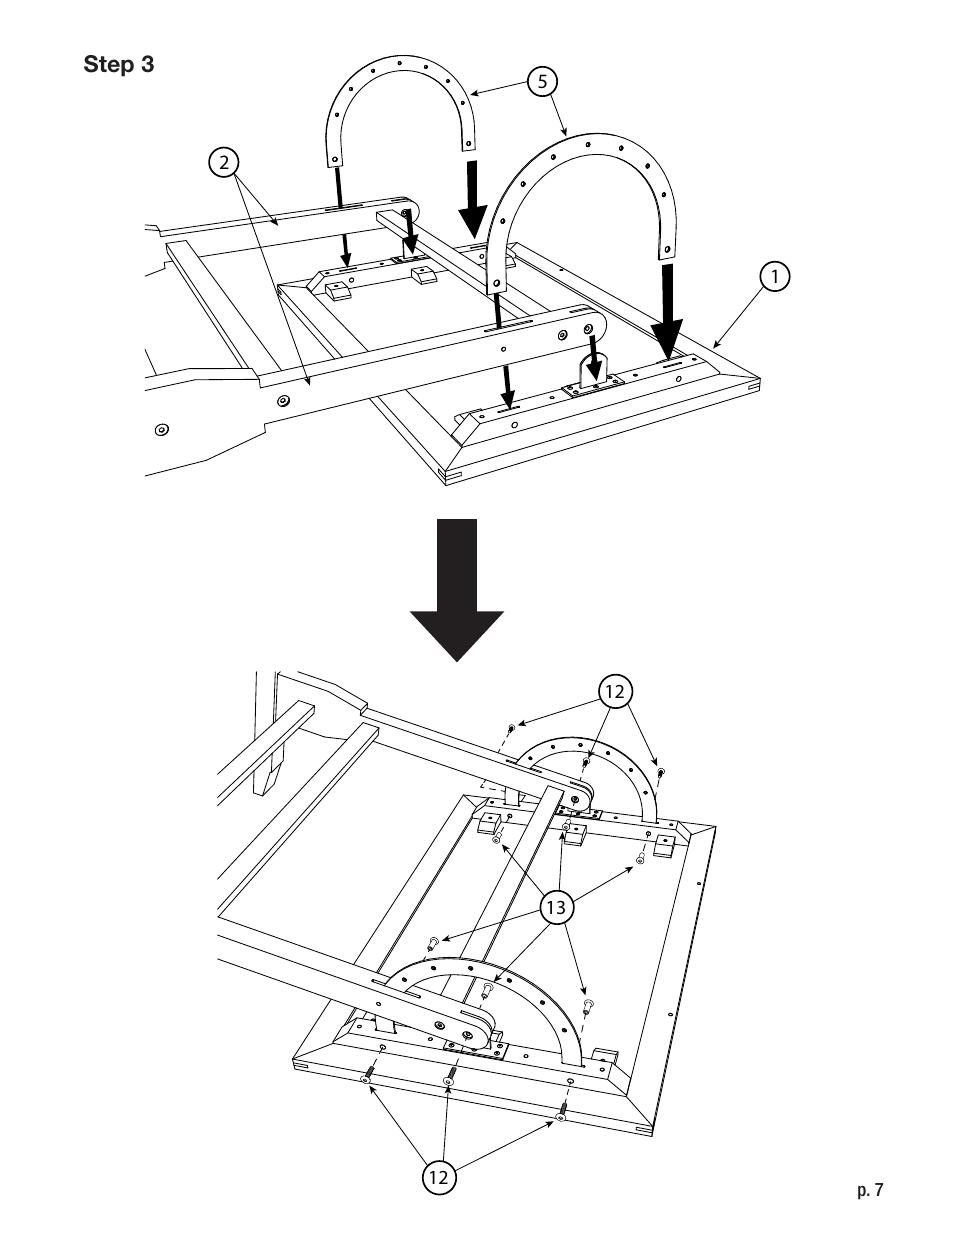 Studio Designs Vintage Drafting Table 42 inch User Manual